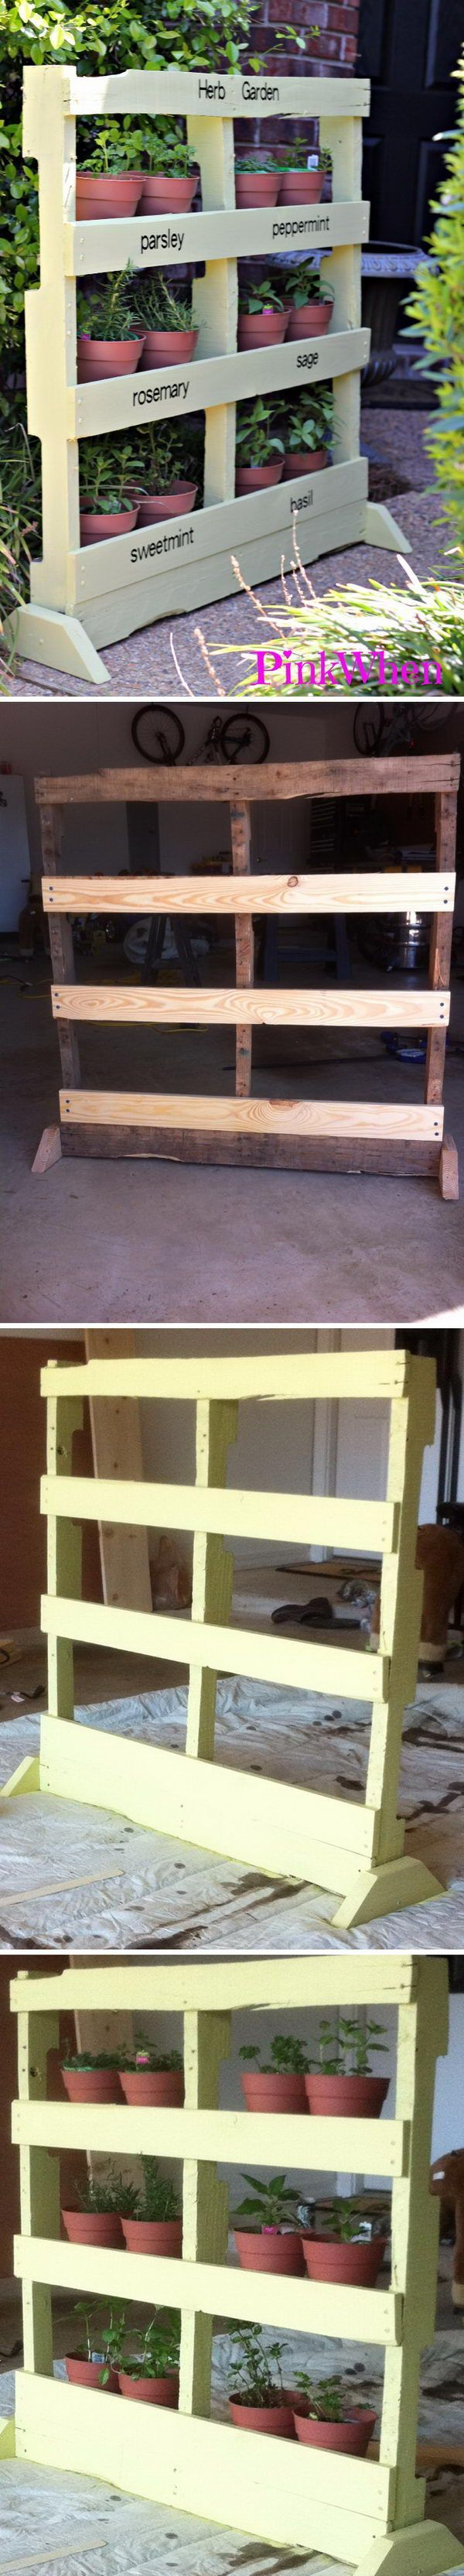 15 diy garden planter ideas using wood pallets - Garden Ideas Using Wooden Pallets